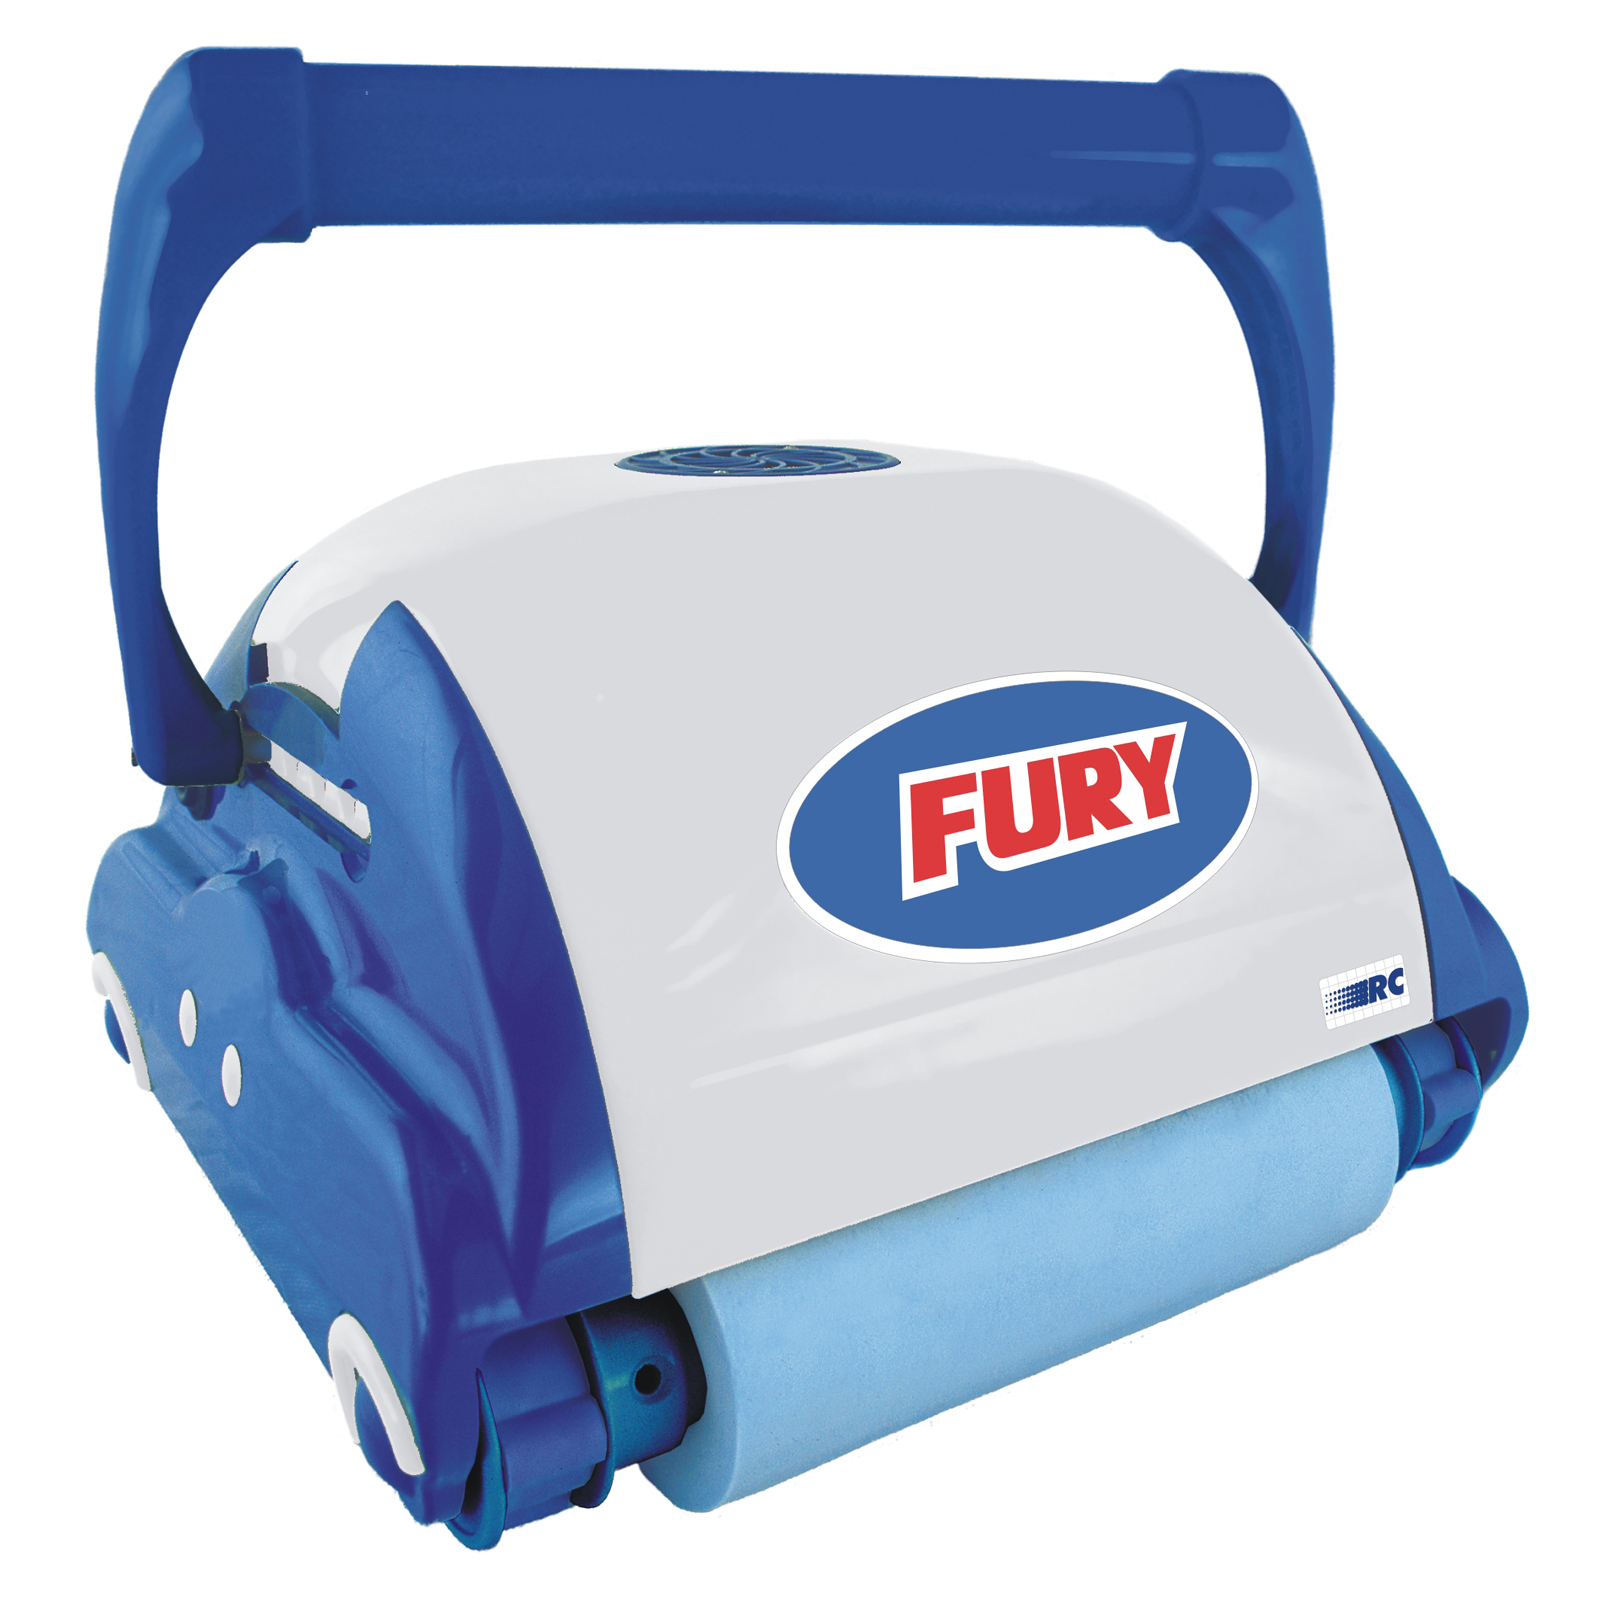 Aquabot Fury